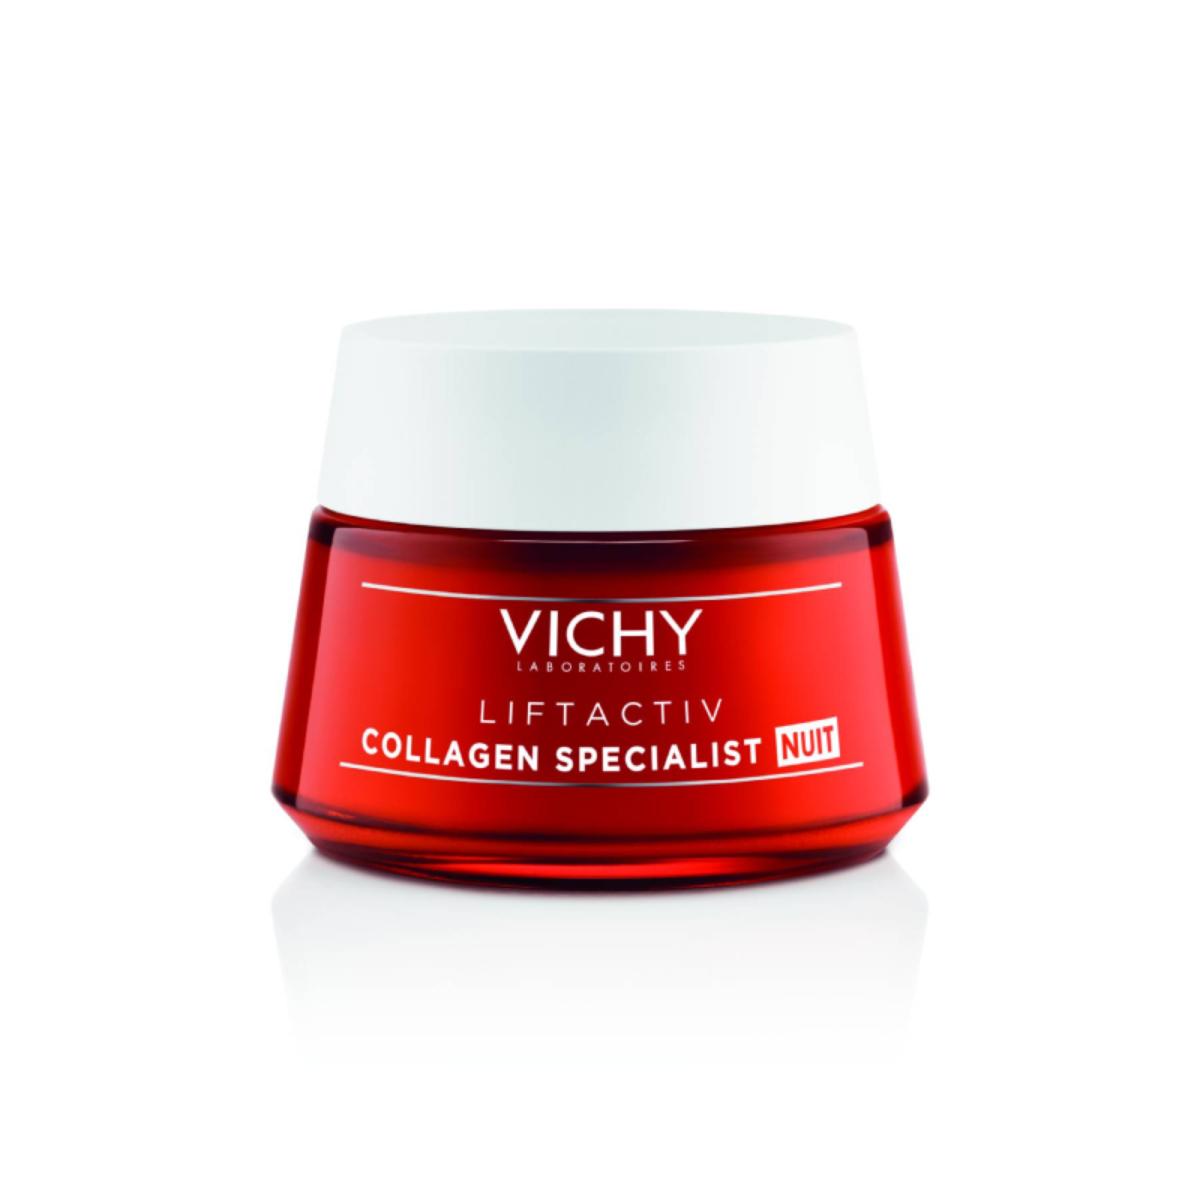 VICHY LIFTACTIV COLLAGEN SPECIALIST NIGHT KREMA 50ML